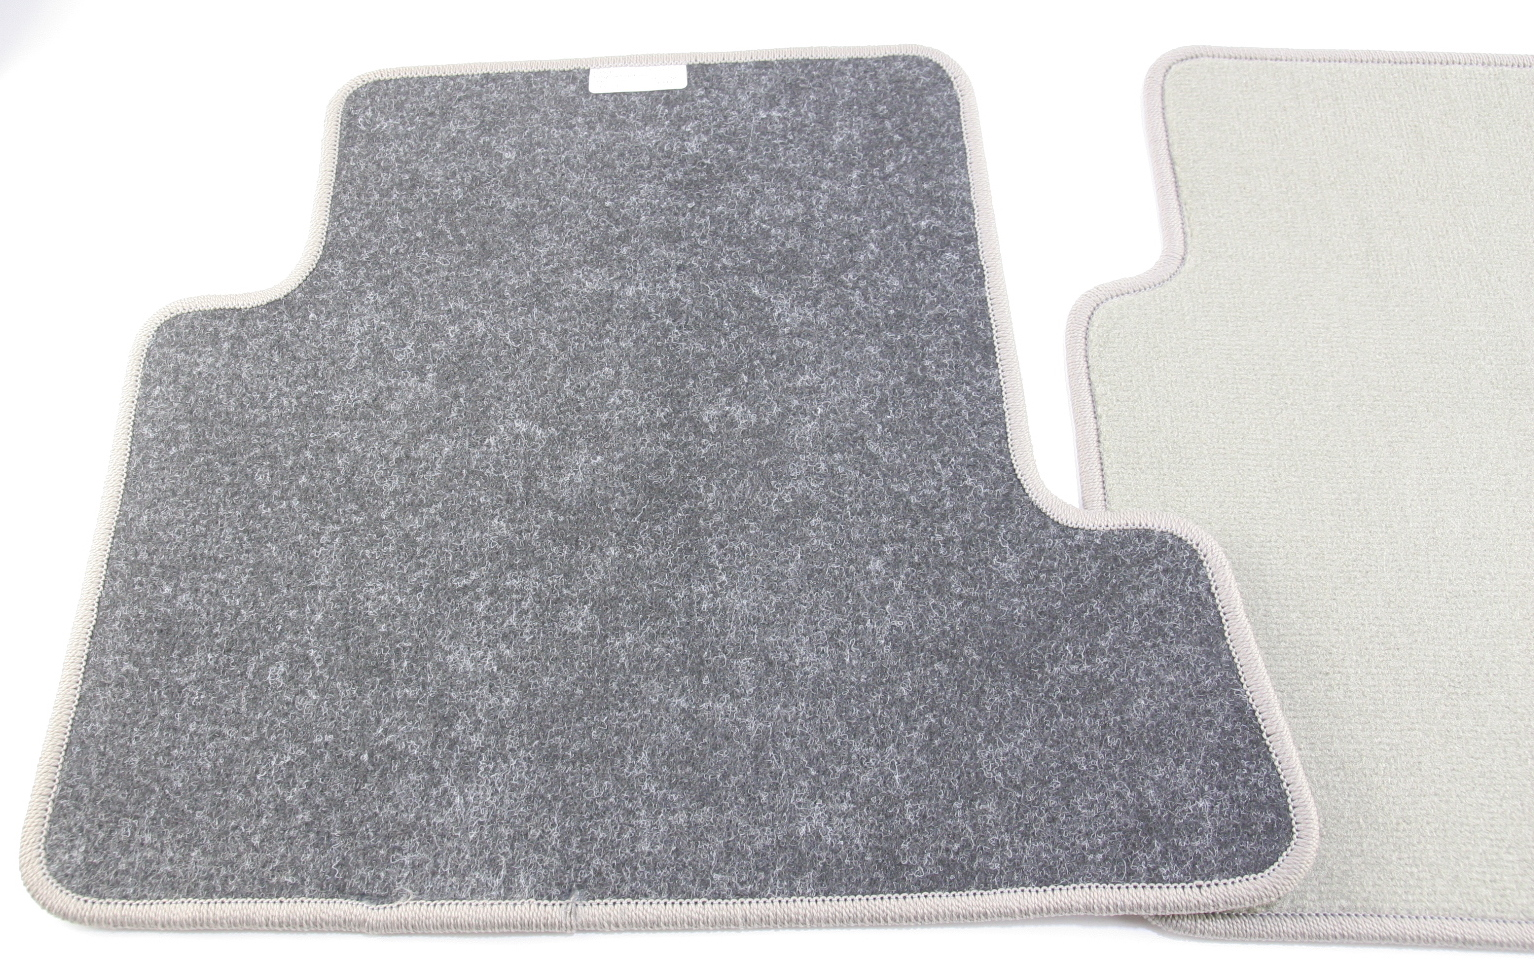 ***~ New OEM Ford CJ5Z7813106AA 13-16 Escape Carpet Rear Mats Medium Light Stone - image 4